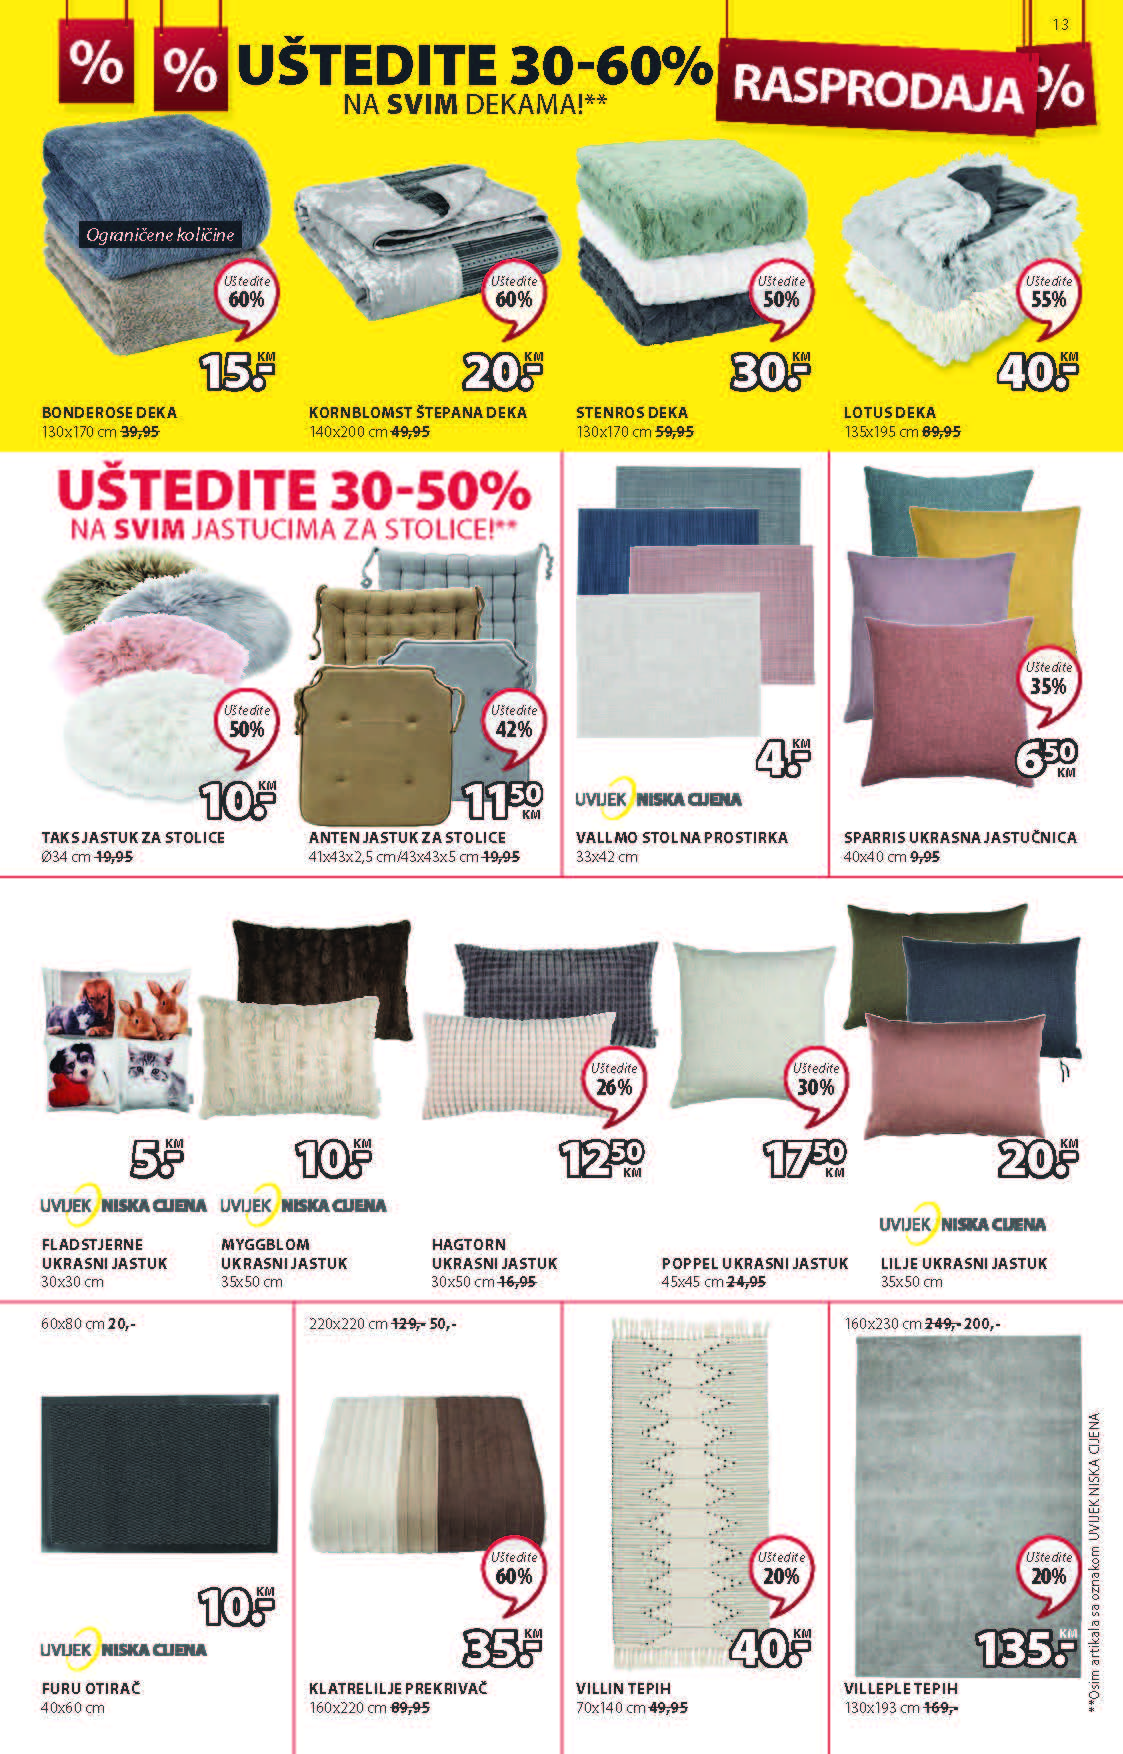 JYSK Katalog Ljetna RASPRODAJA JUN 2021 17.6. 30.6. ekatalozi.com PR Page 14